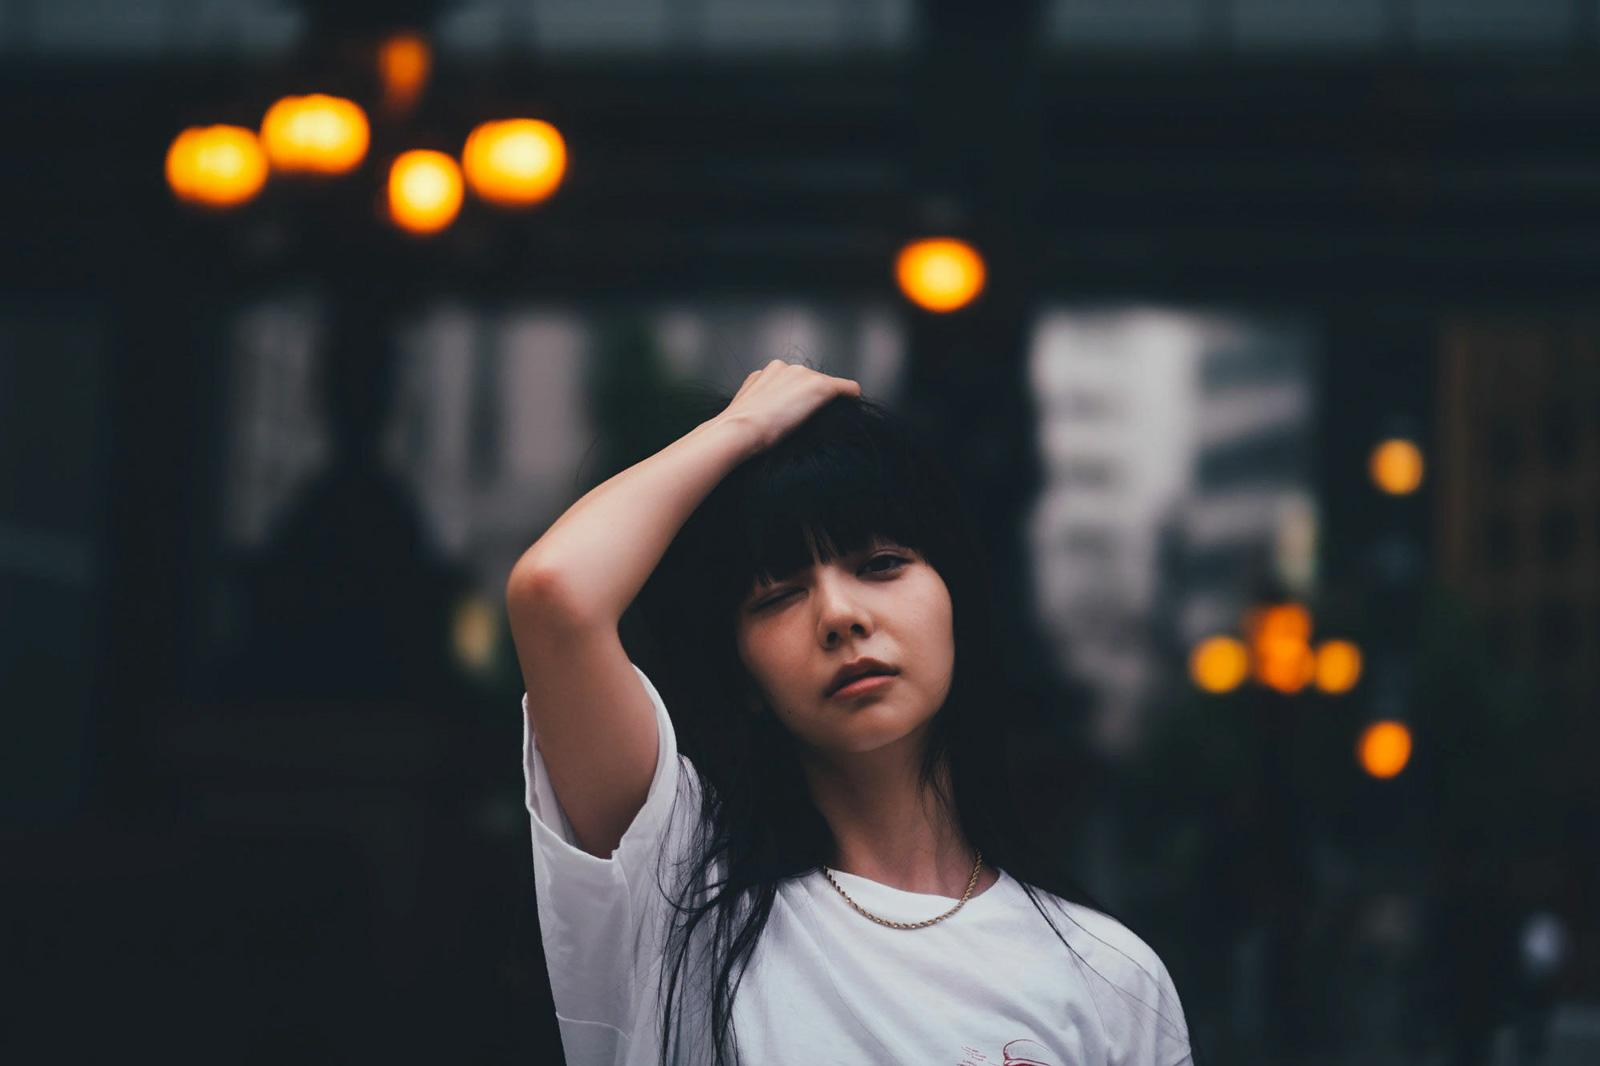 Photographer: Takeshi YASUI